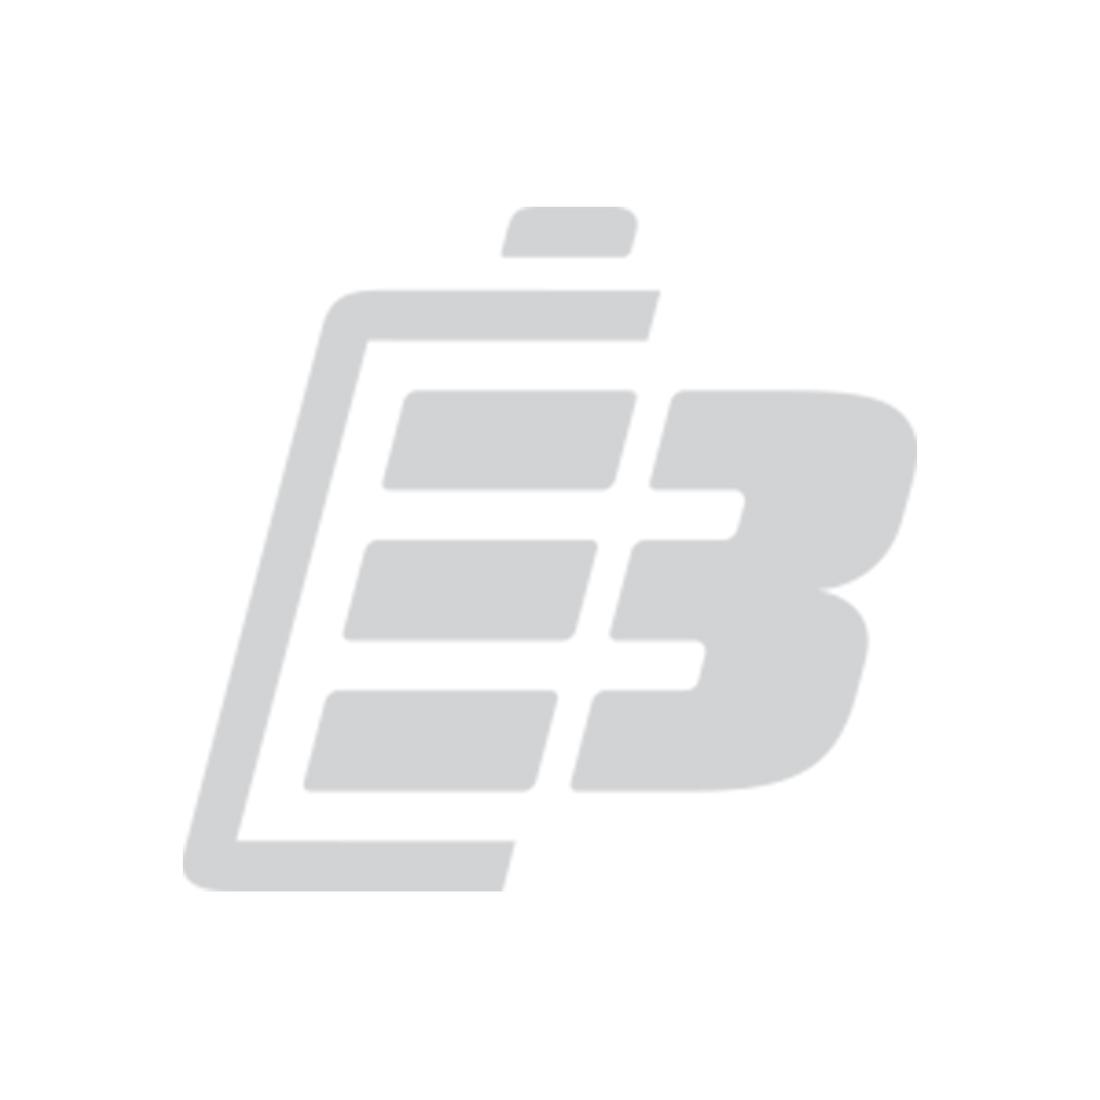 Two-Way radio battery Icom BP-196 1800mah_1